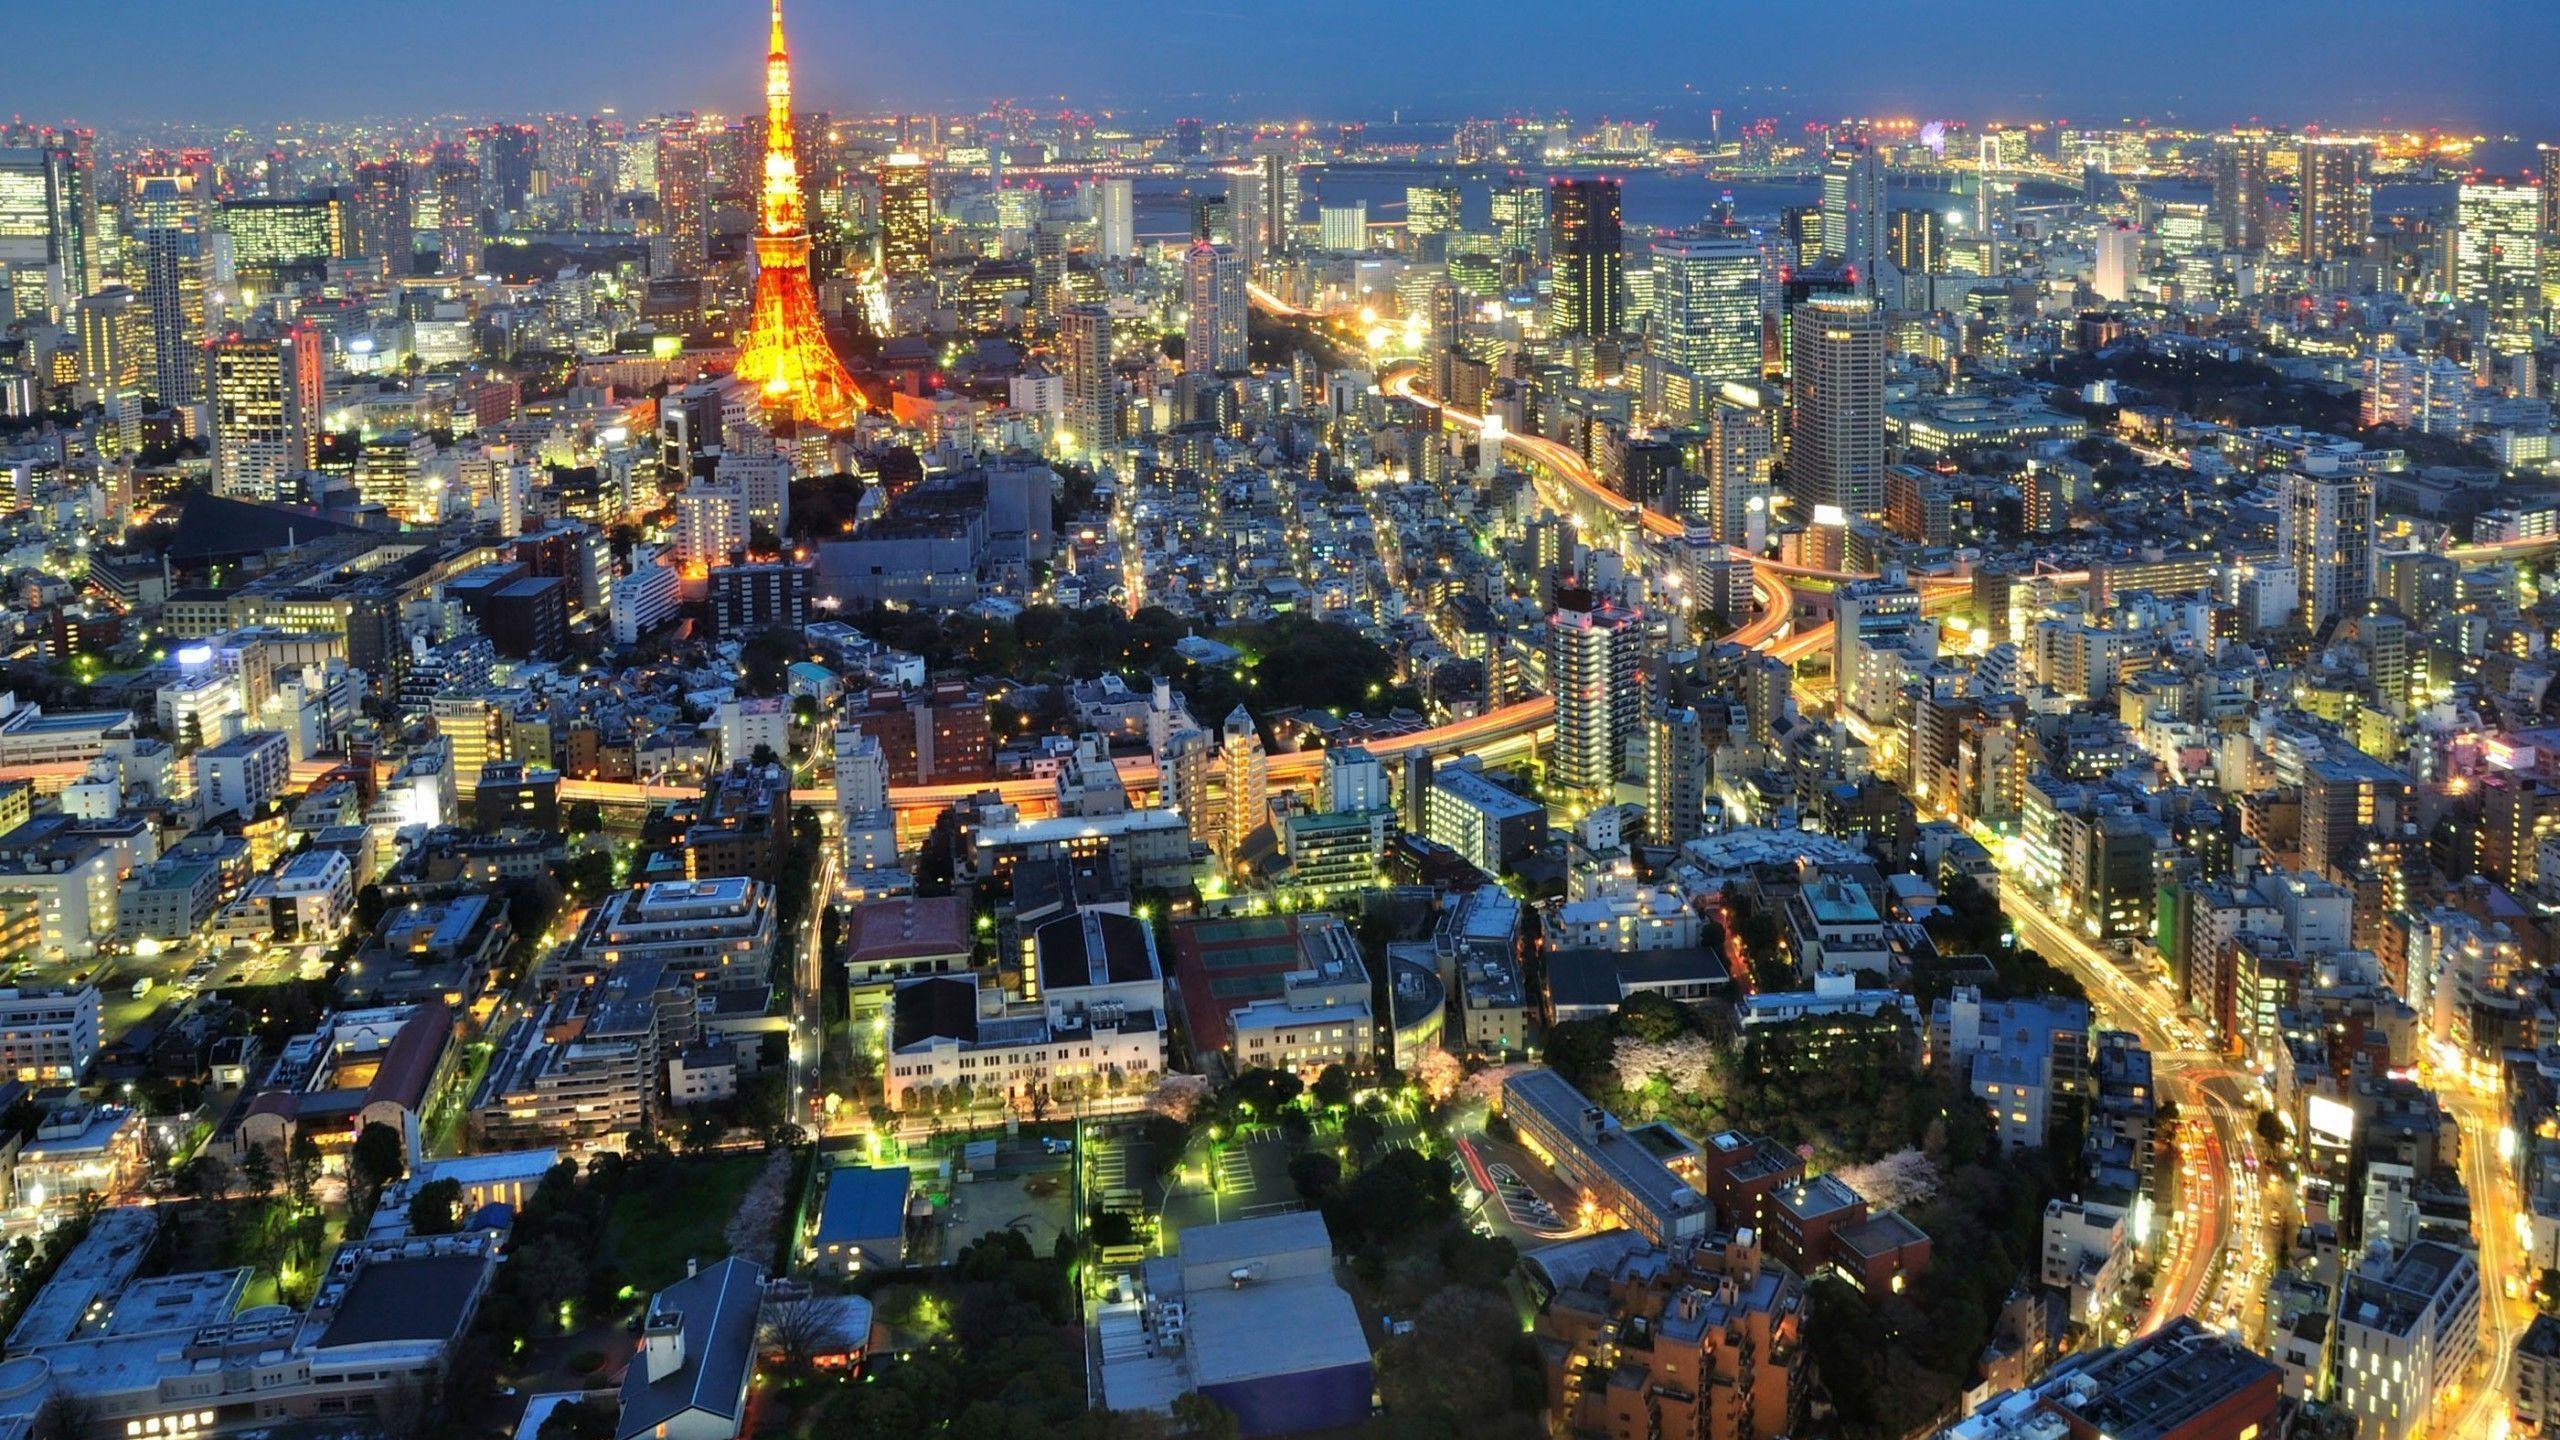 HD Quality Tokyo City Desktop Widescreen Wallpaper HD 9 .